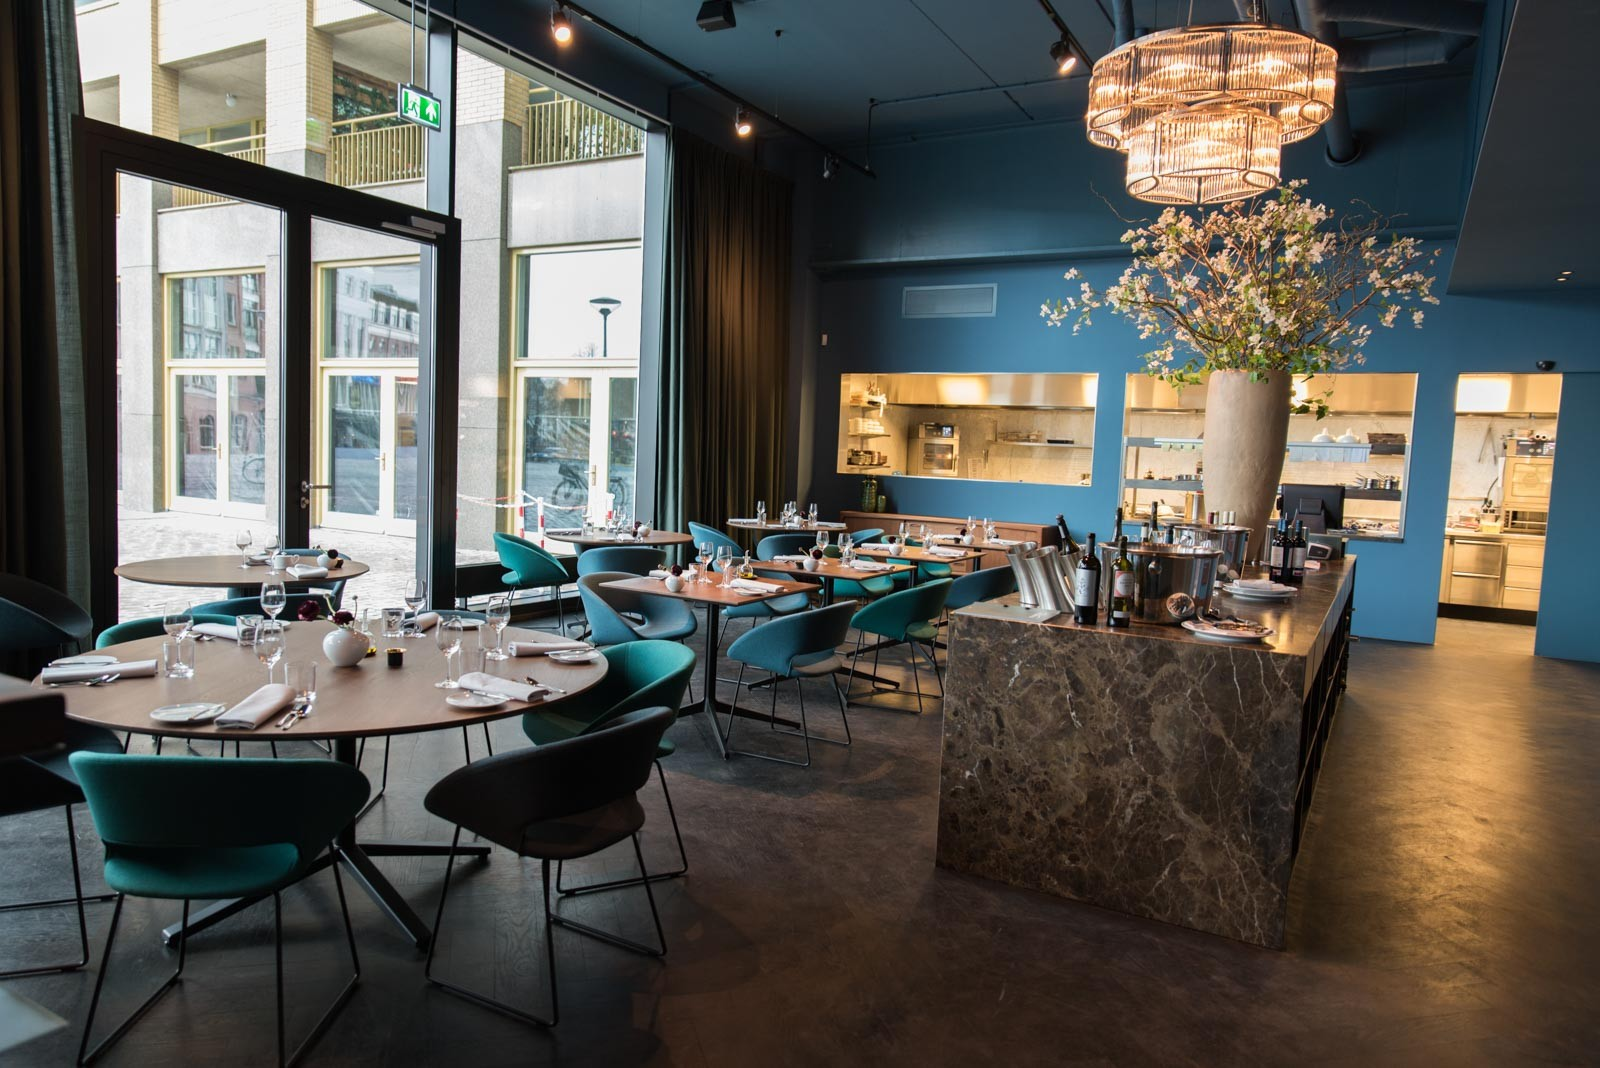 Eetkamer eetkamertafel edge : Restaurant Fitzgerald - Warner Interieur